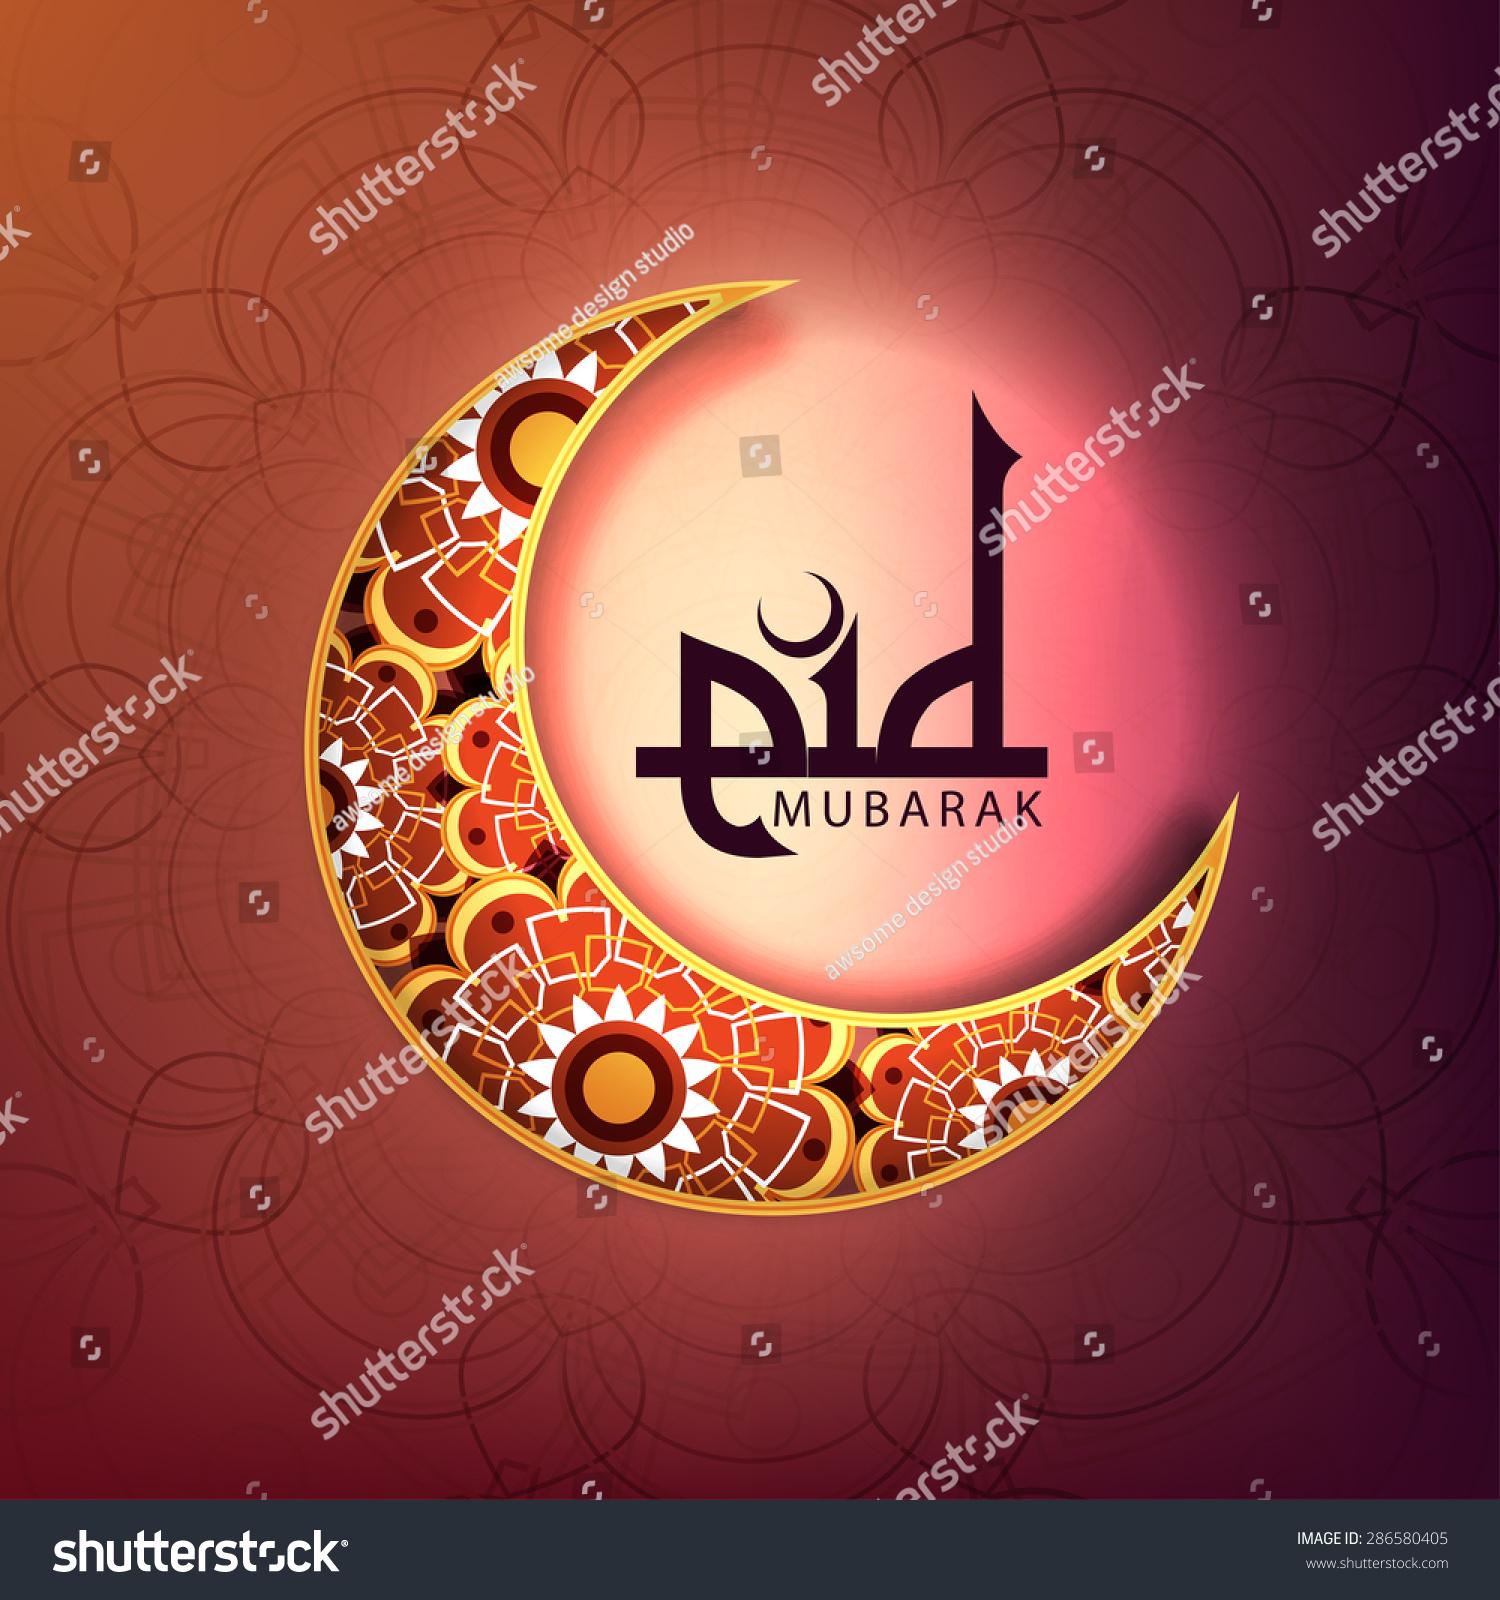 Eid mubarak поздравления картинки 81